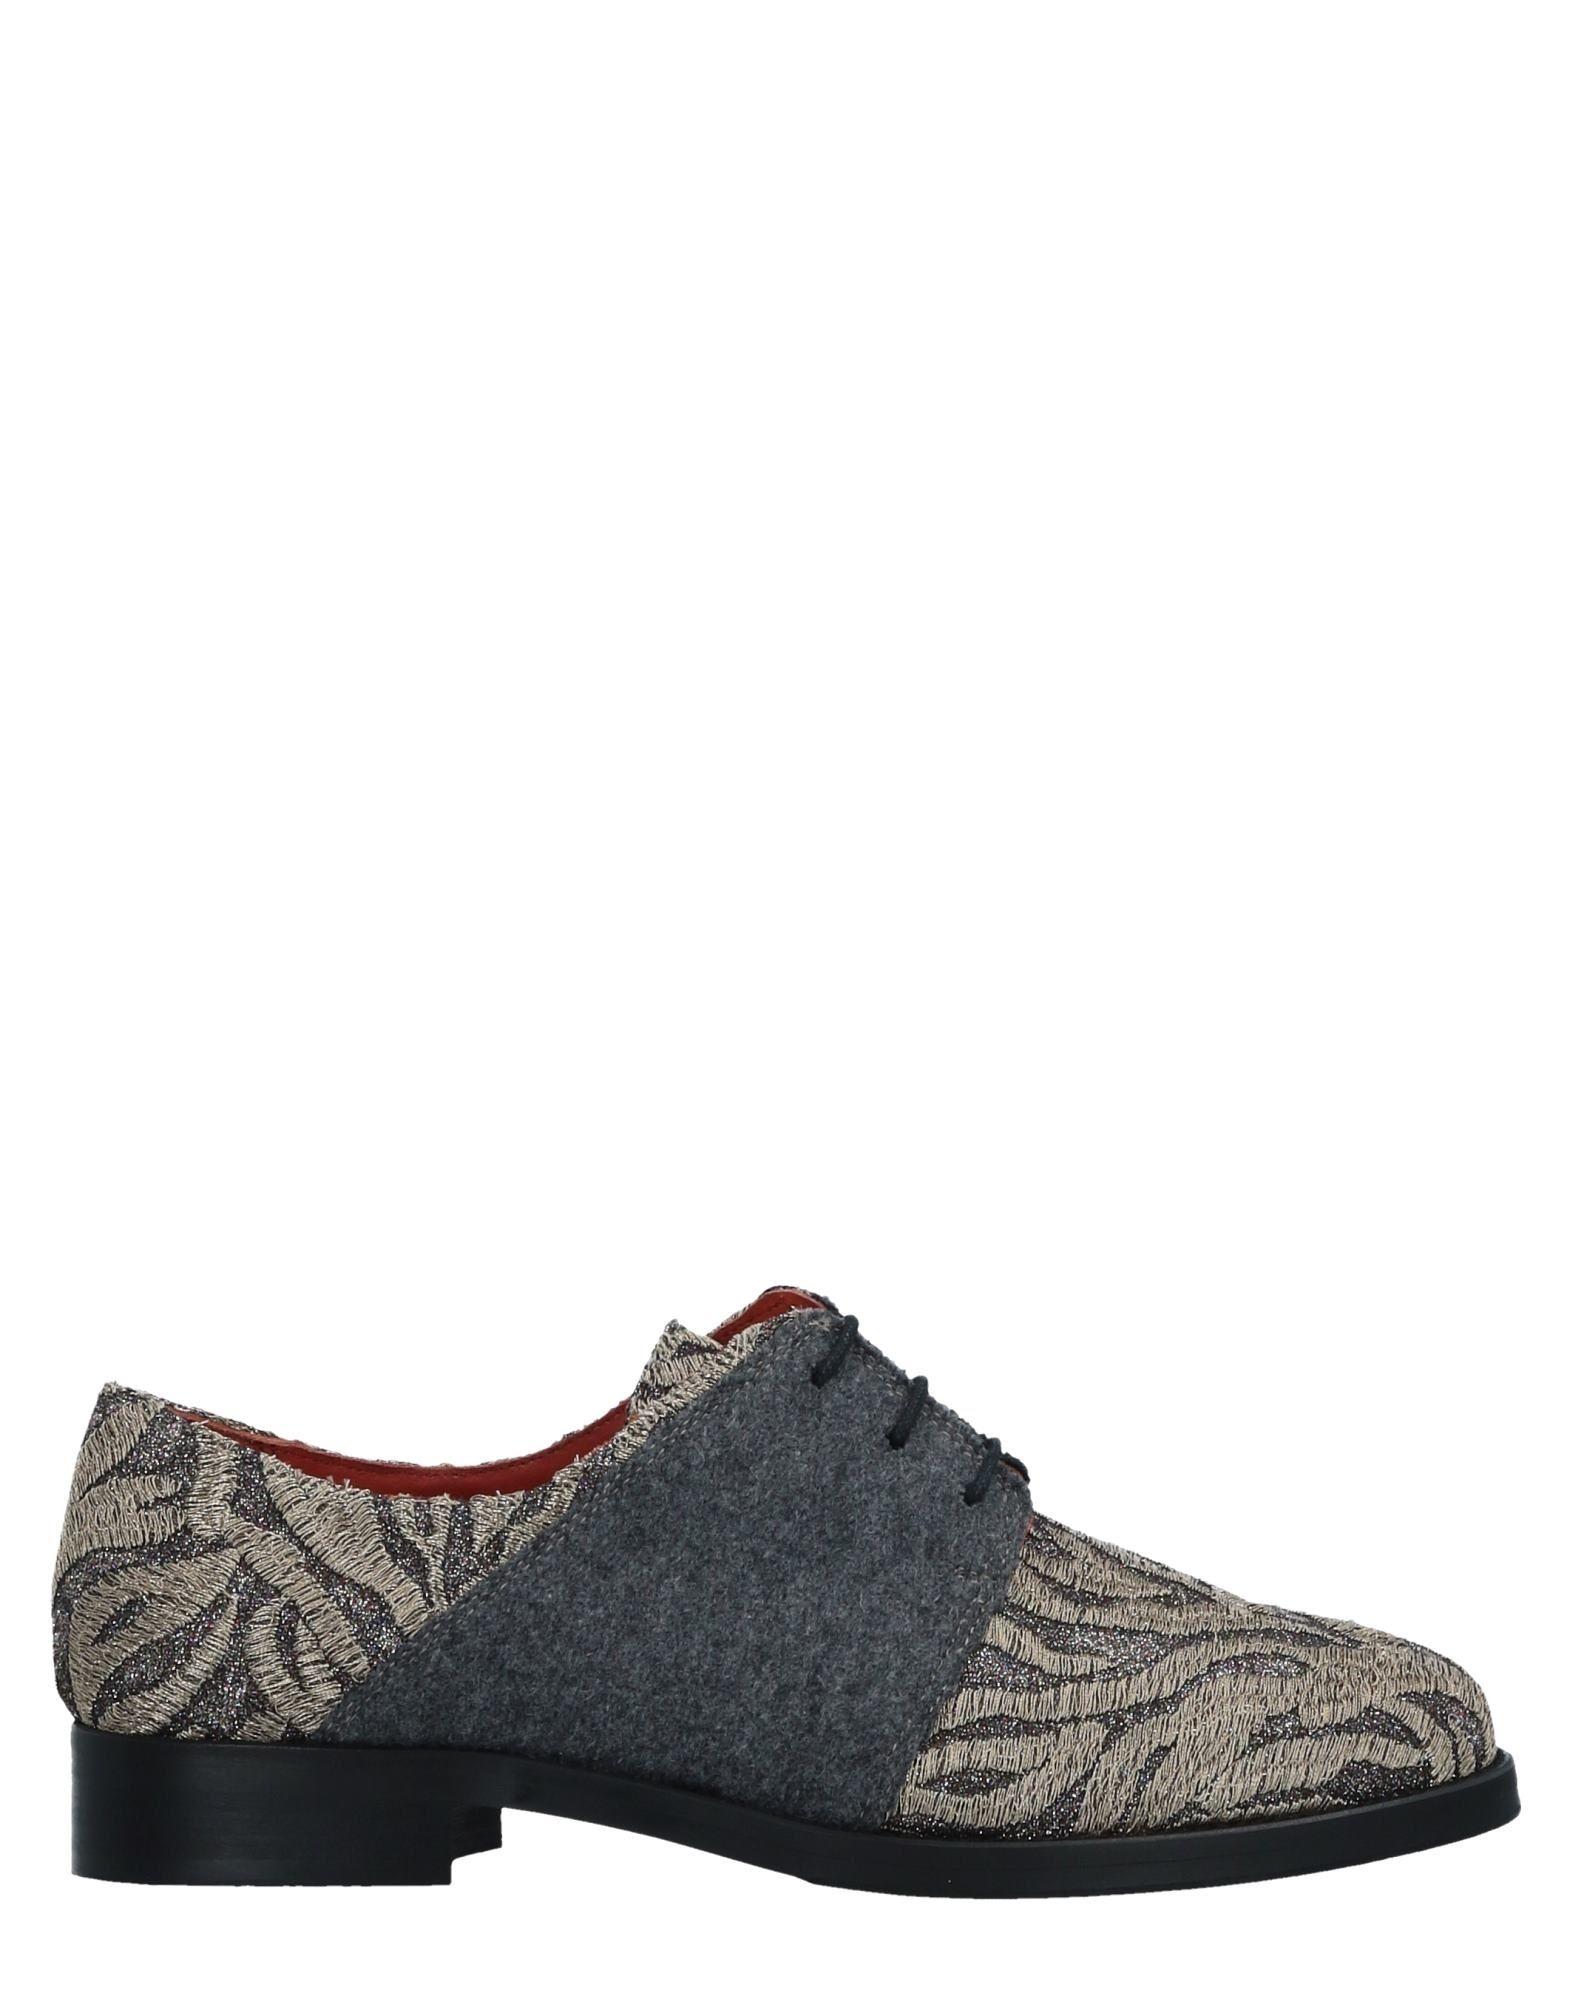 Bagatt Schnürschuhe Damen  11515353GB Gute Qualität beliebte Schuhe